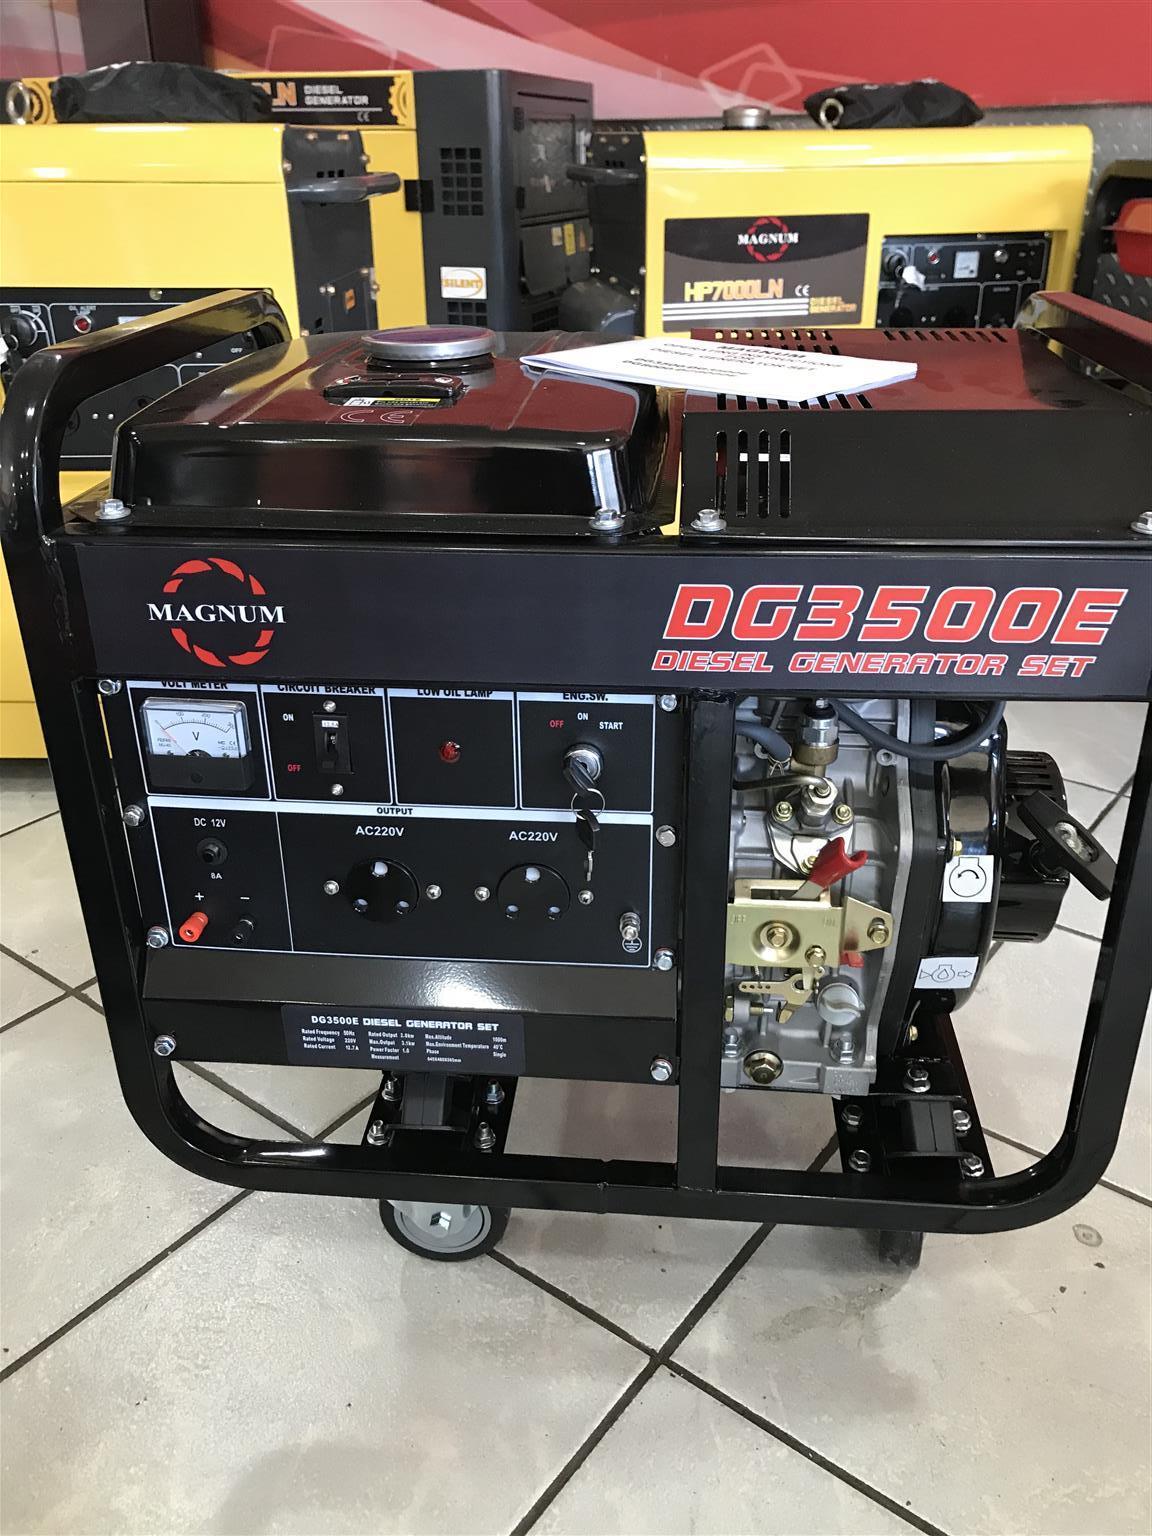 Magnum Diesel generator 3.5kva single phase price incl vat